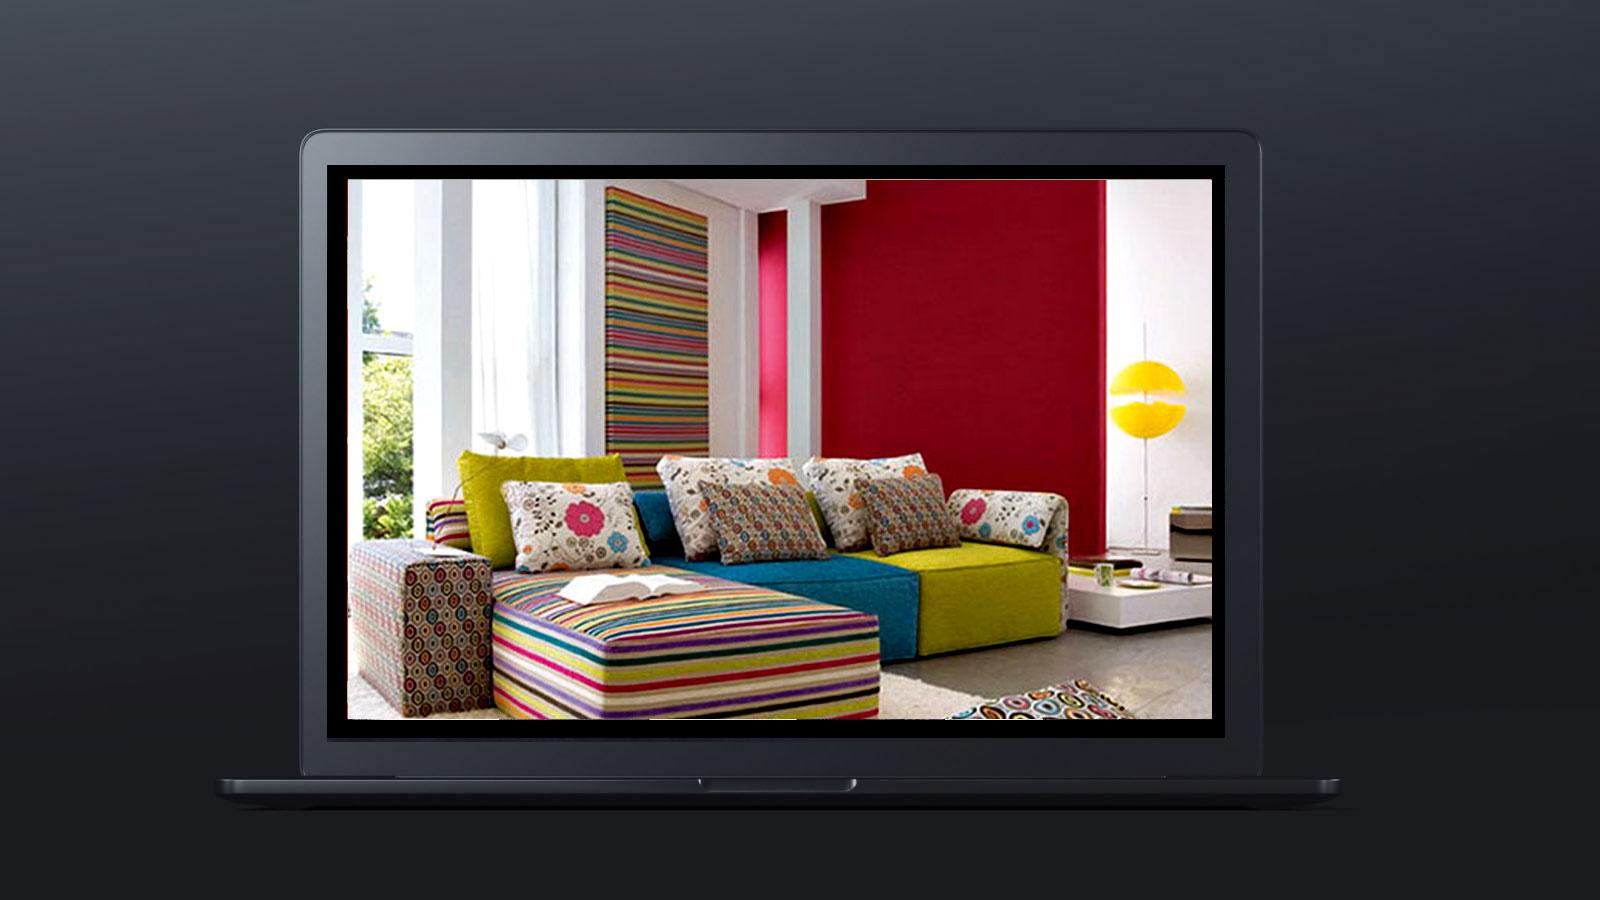 Design Color 109 - نقش رنگ و رنگ آمیزی در دکوراسیون داخلی